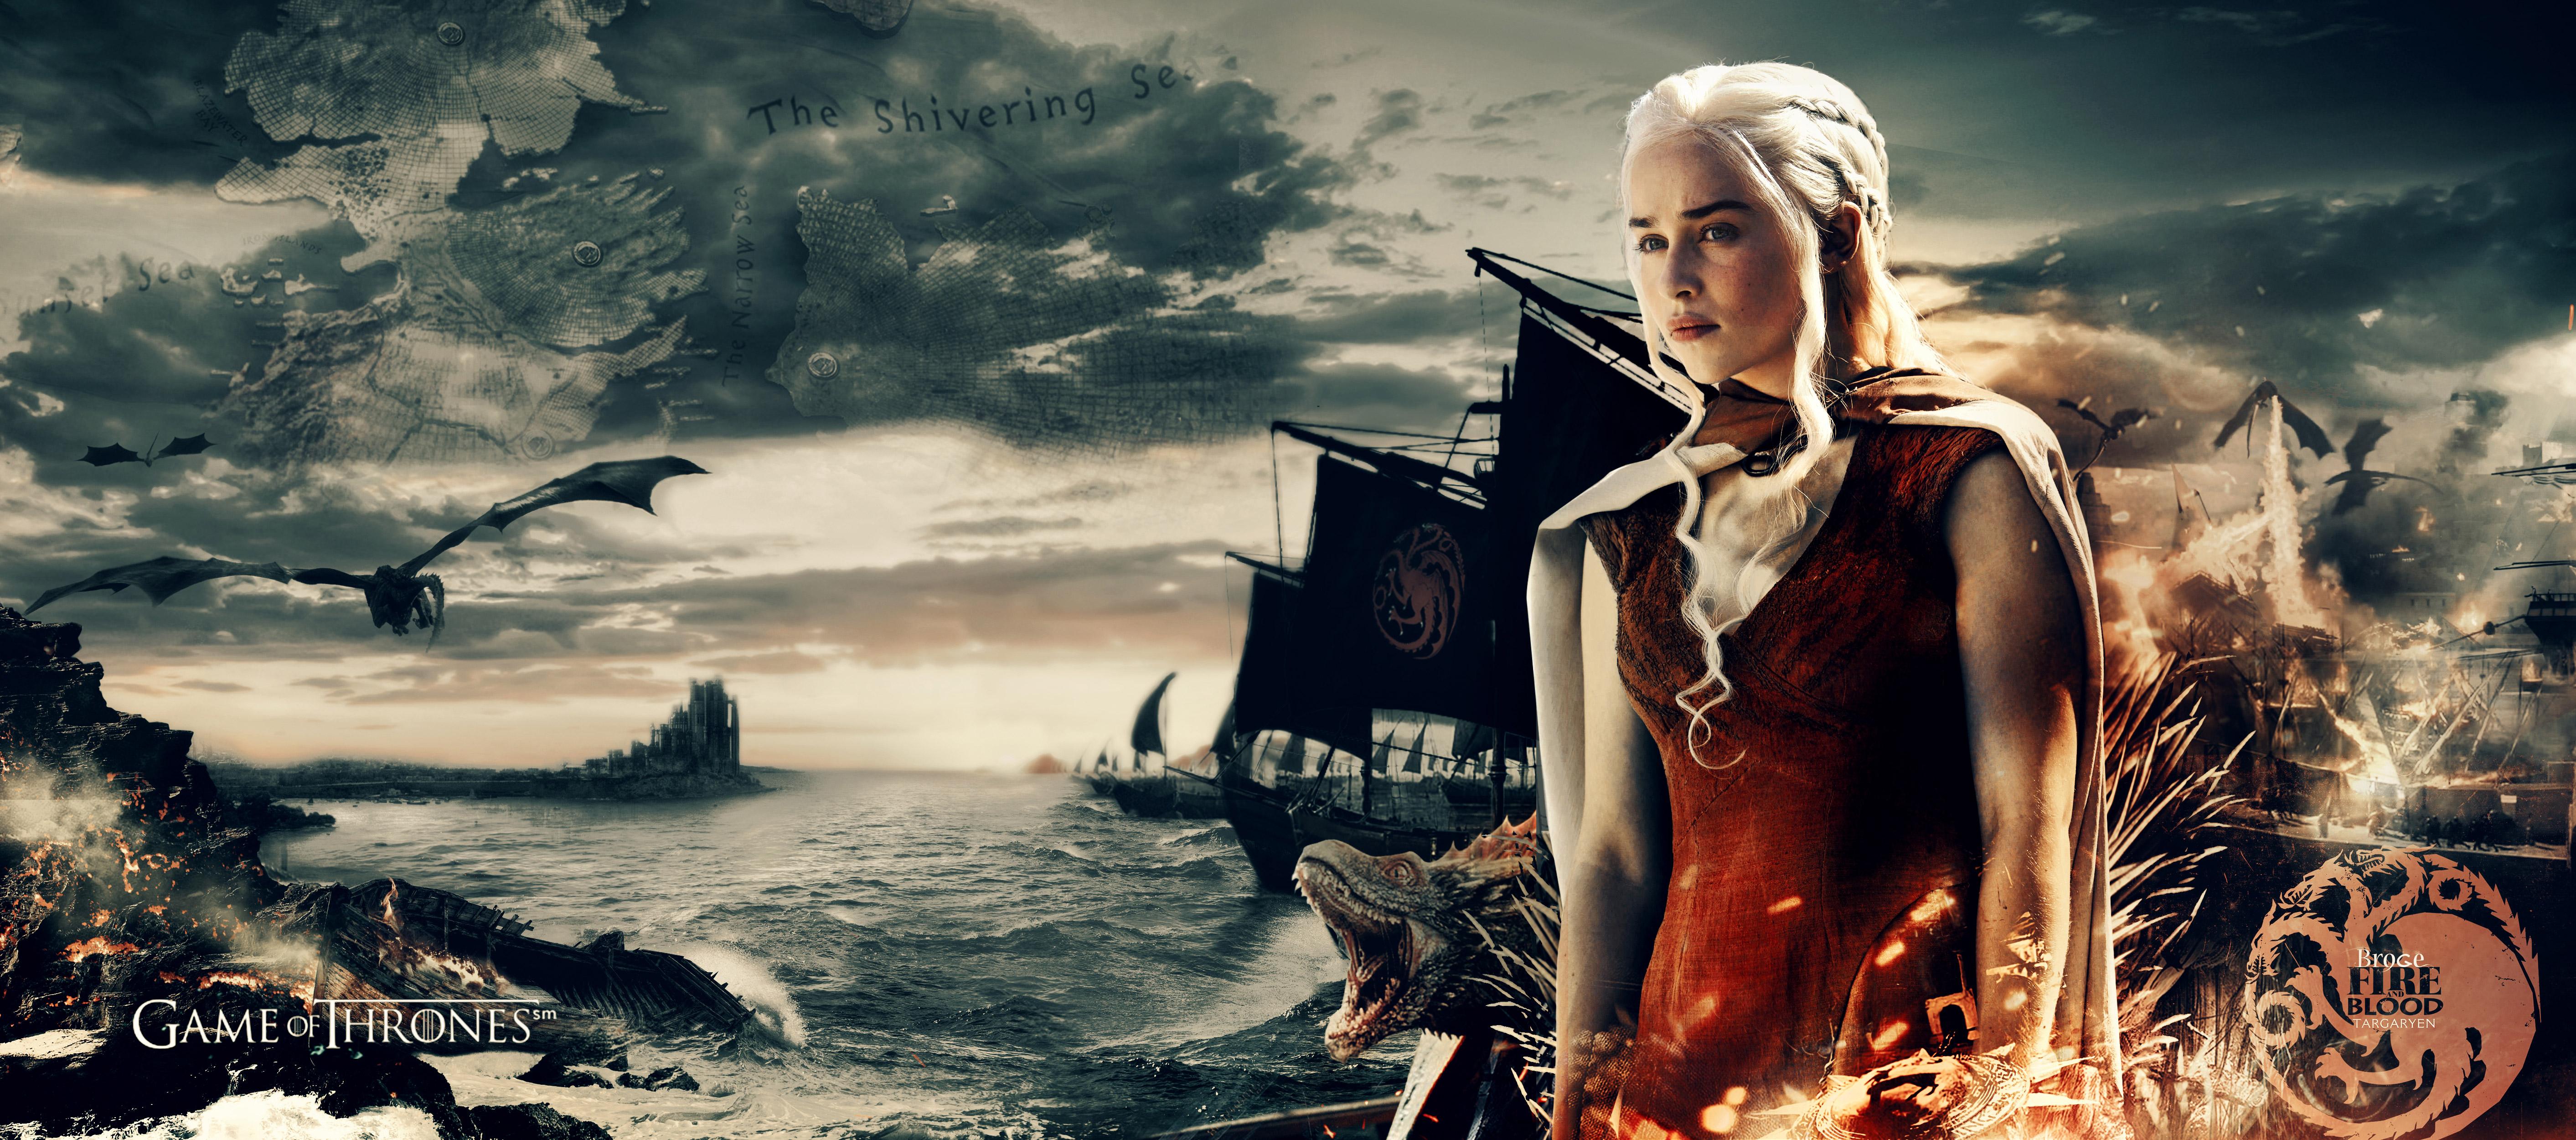 Daenerys Targaryen 5k HD Tv Shows 4k Wallpapers Images